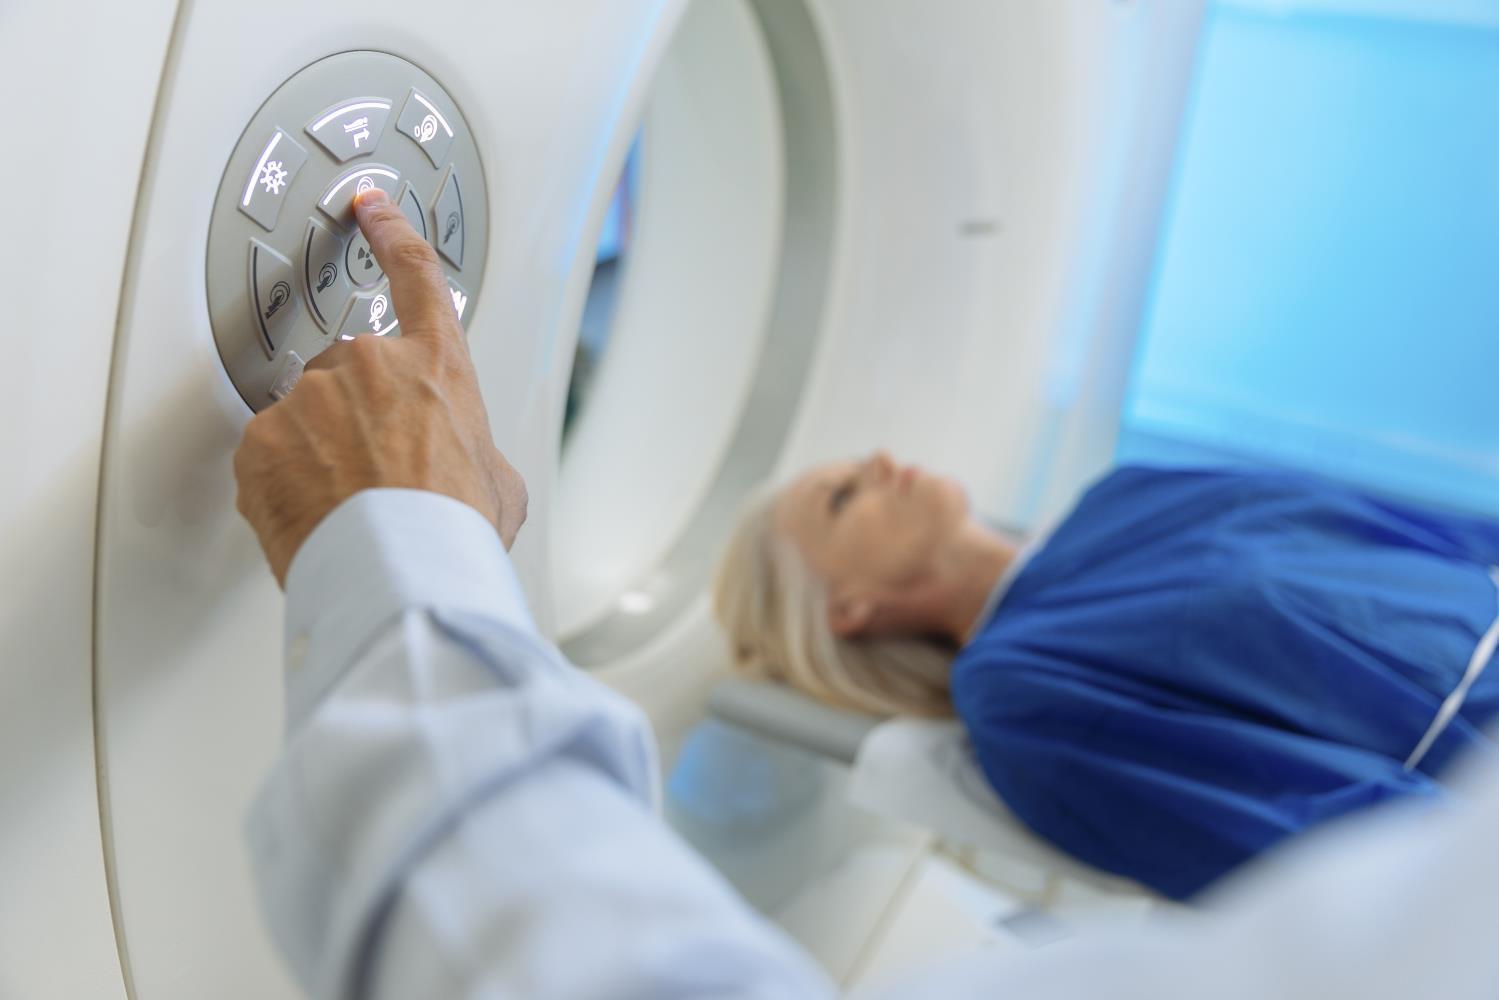 Urgent call followed by quick response saves MRI Scanner shutdown